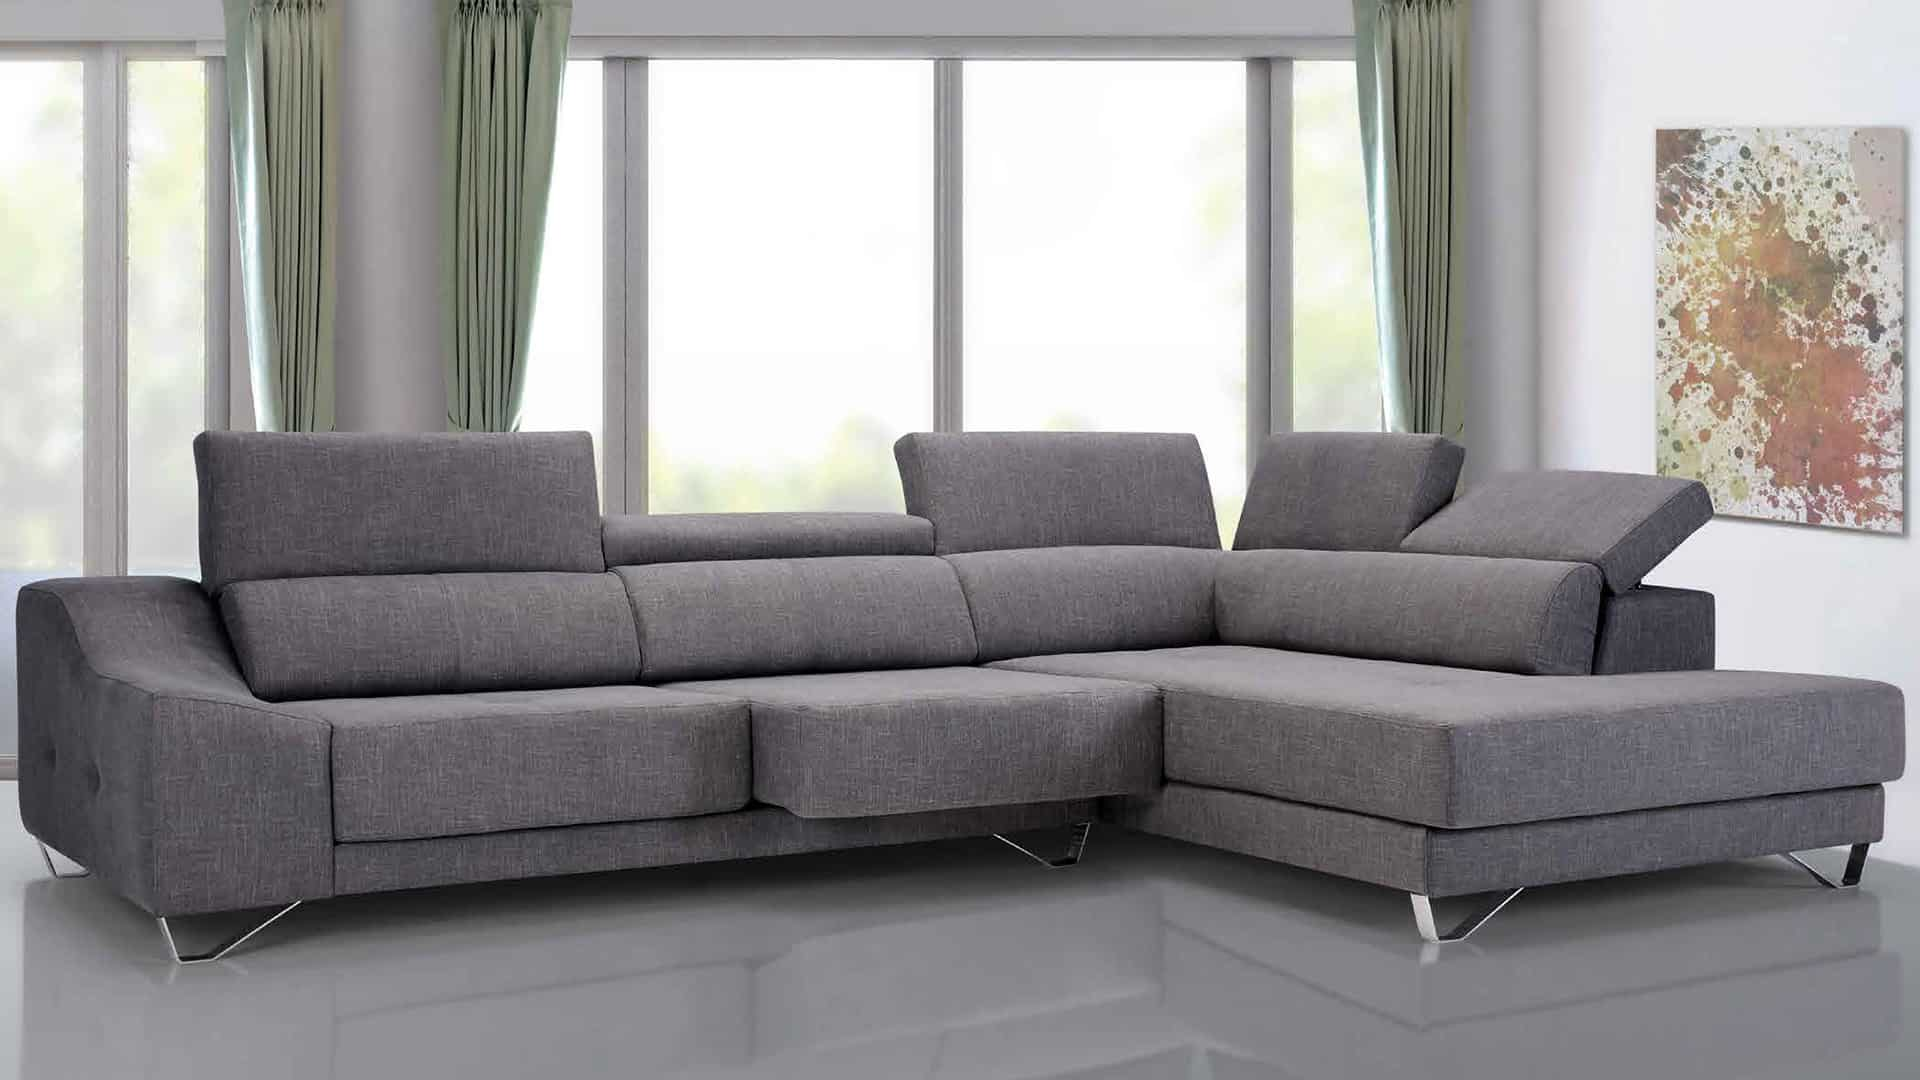 sofa fiore comprar